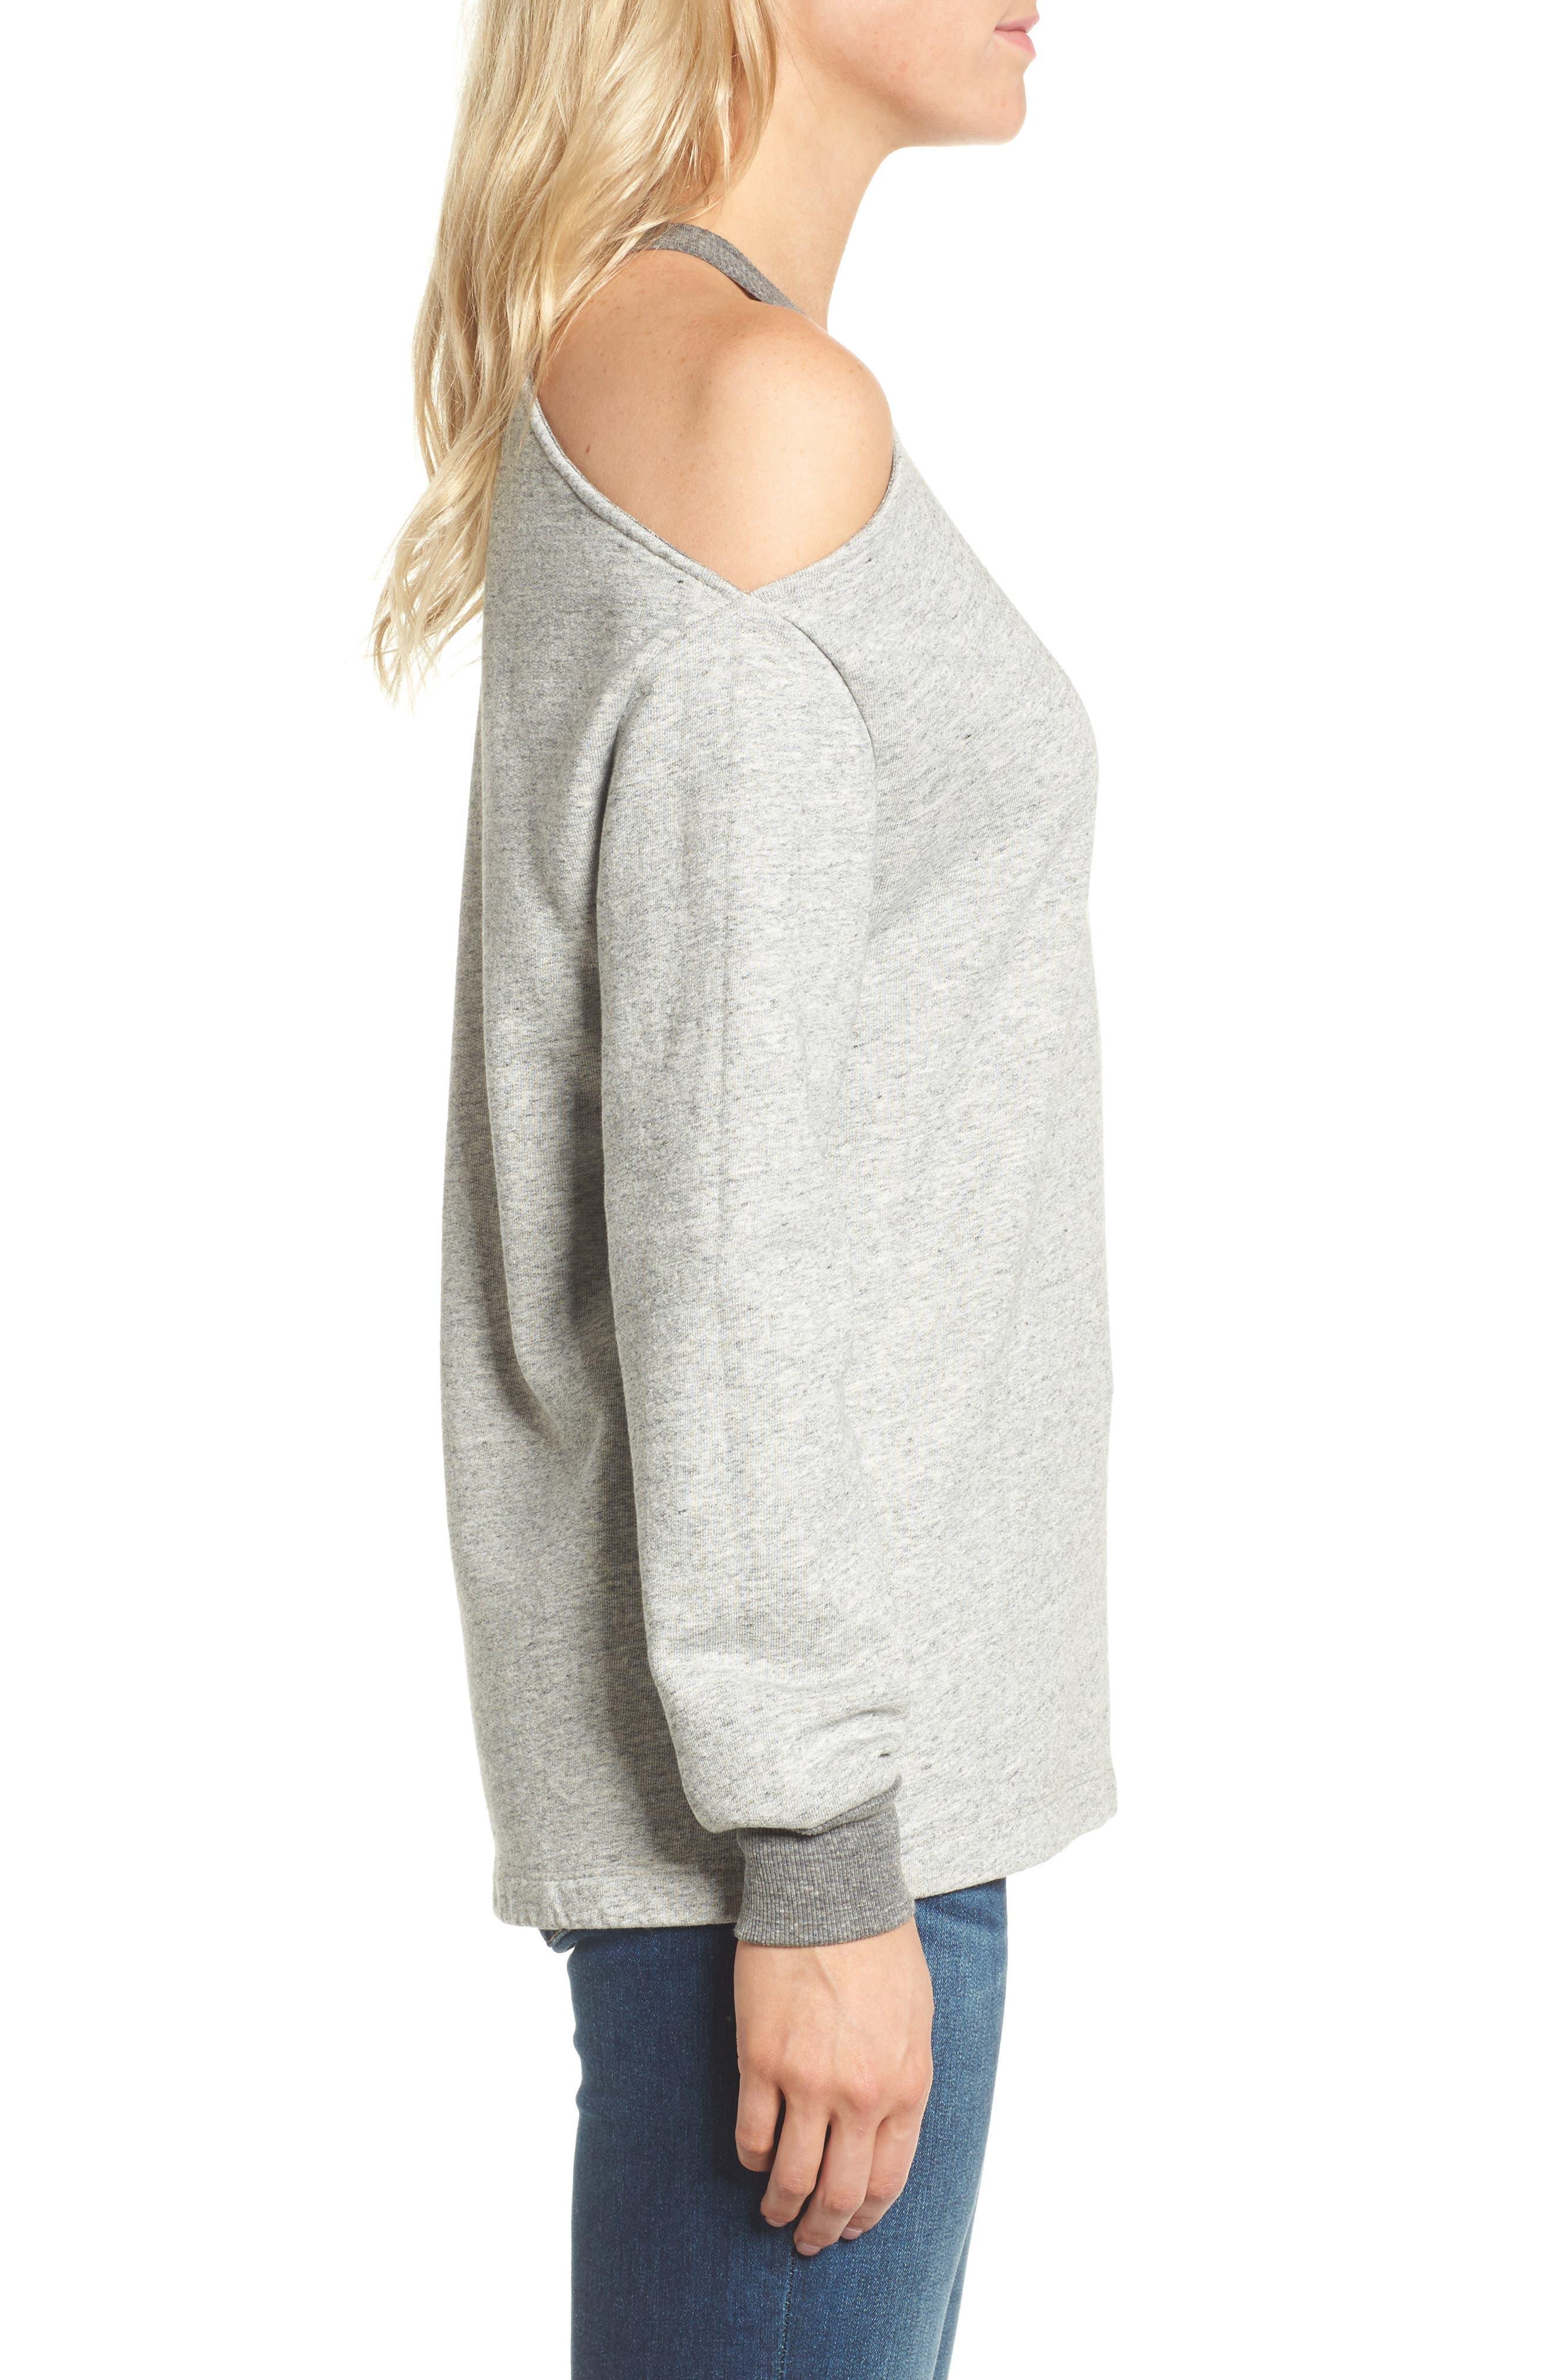 Gizi Cold Shoulder Sweatshirt,                             Alternate thumbnail 3, color,                             022